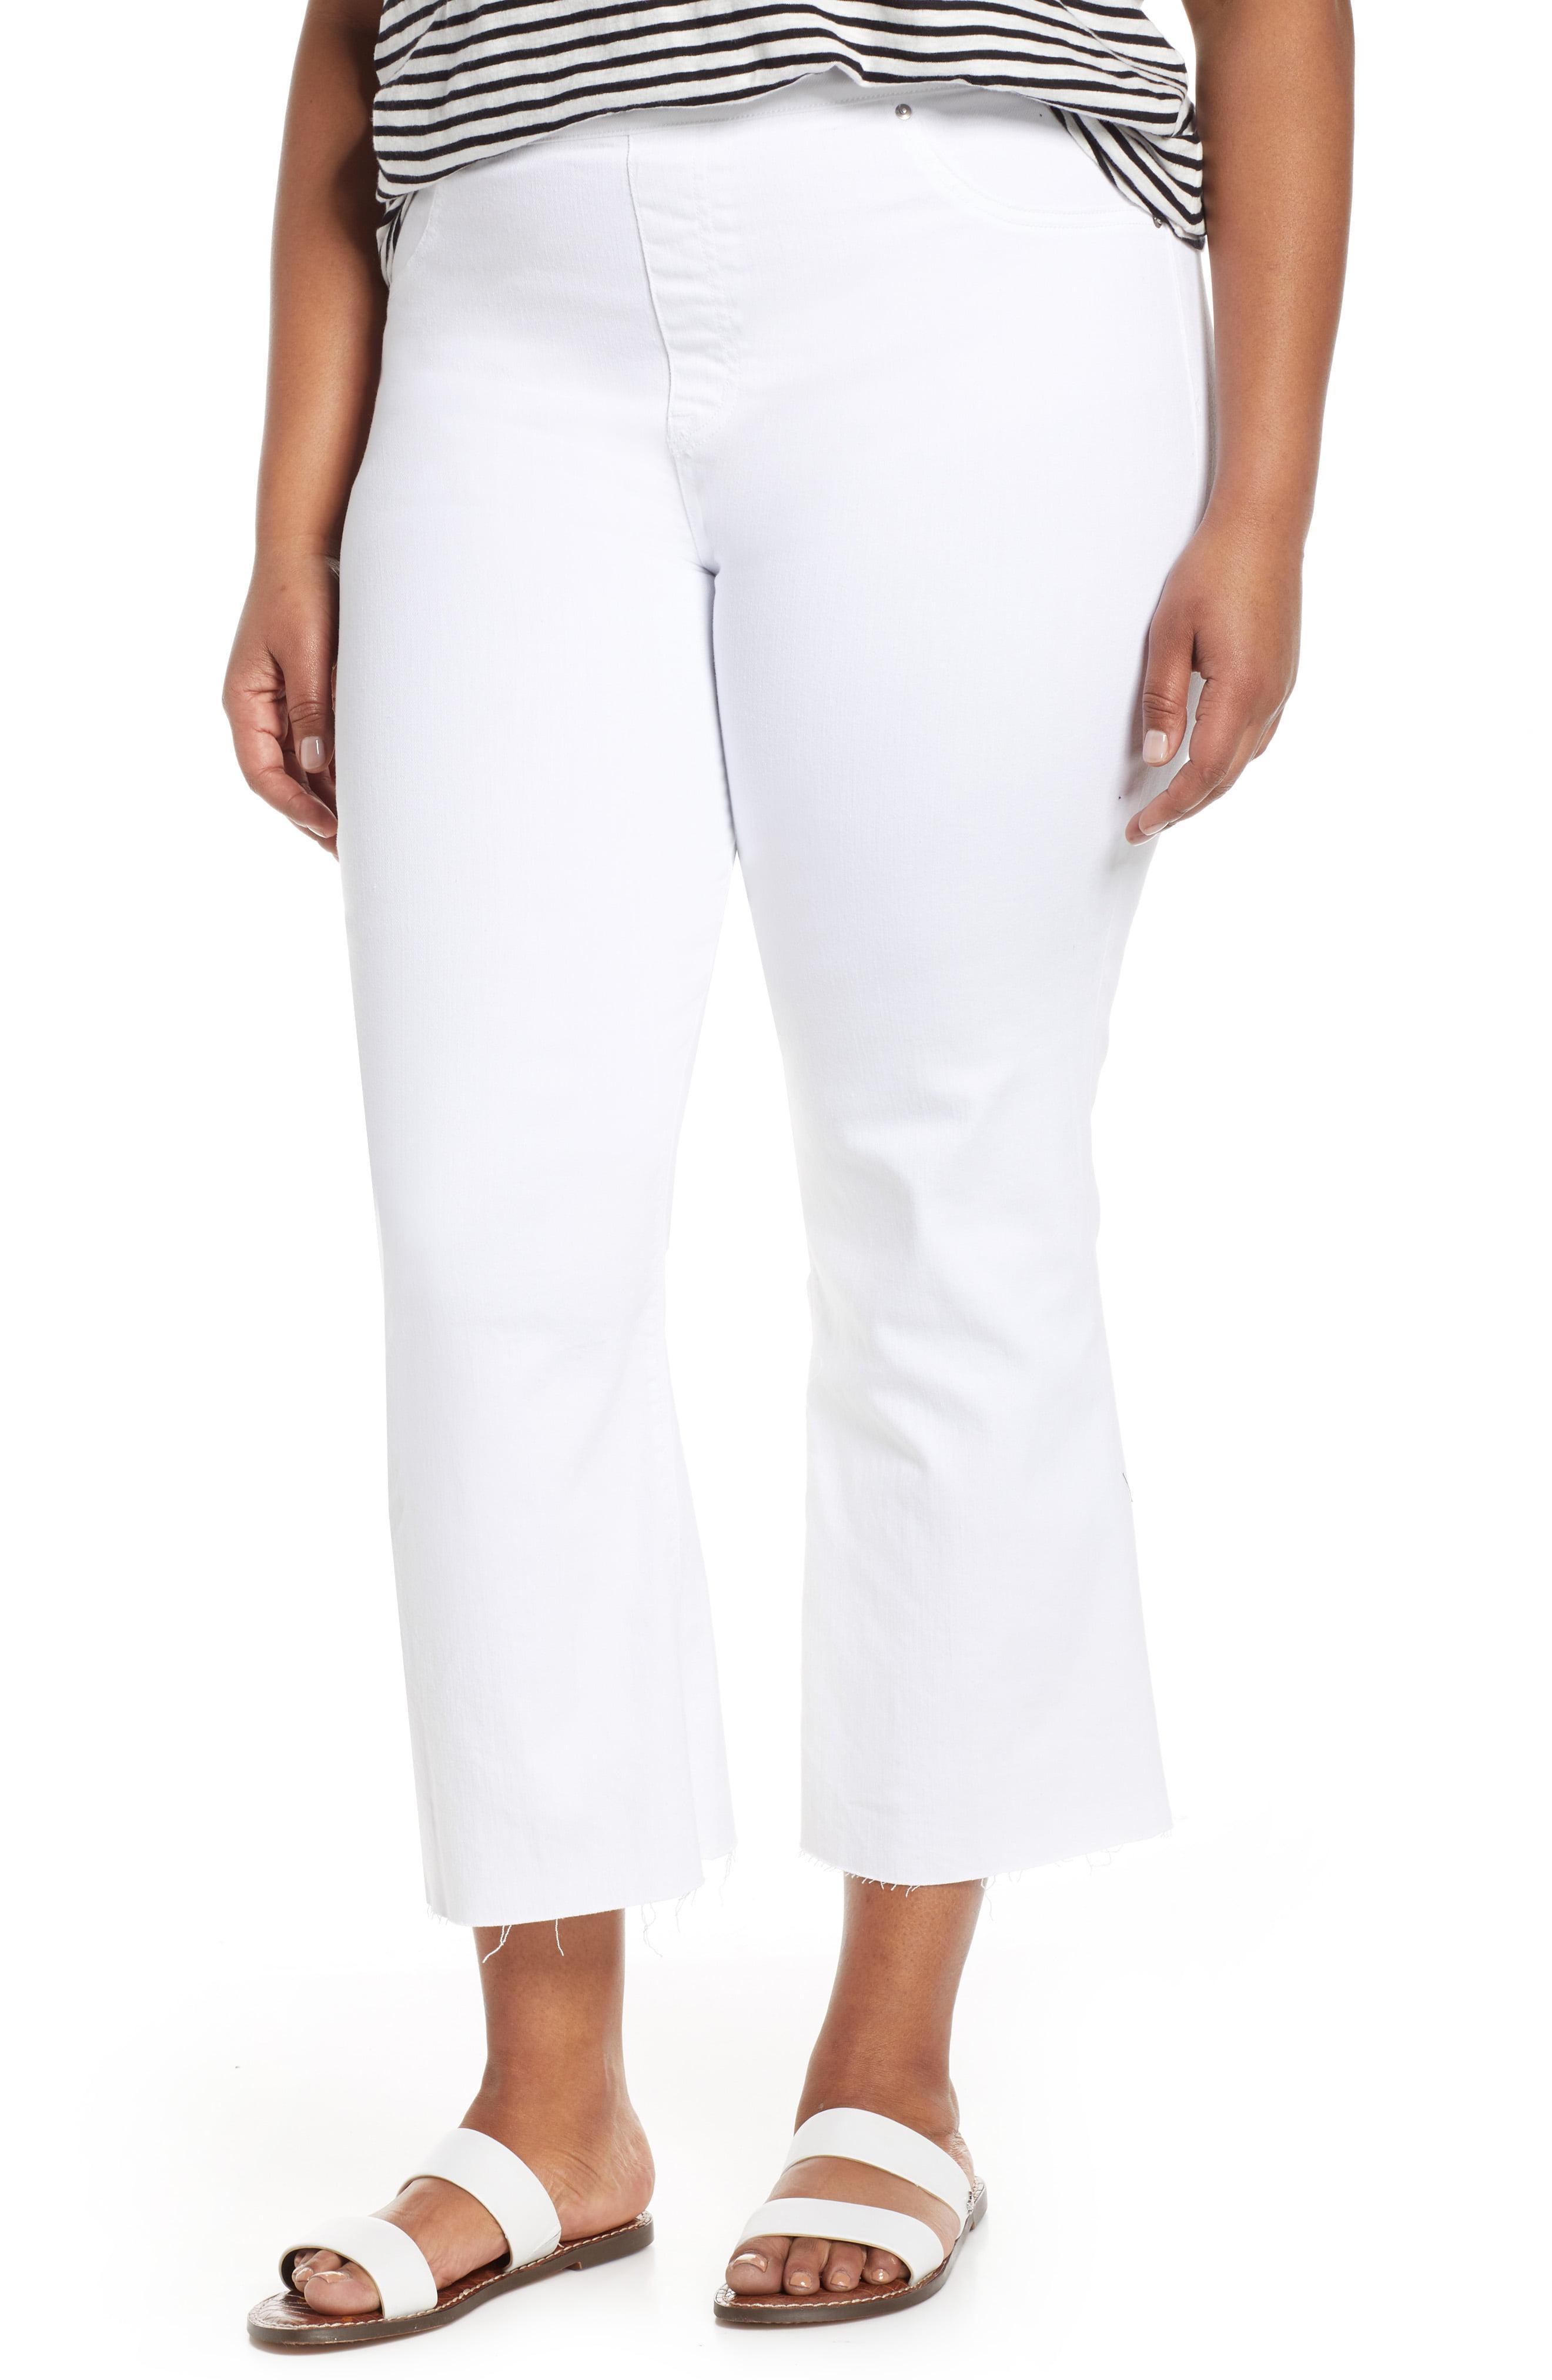 38f8cb9dc1b9d0 Lyst - Spanx Spanx Crop Flare Denim Leggings in White